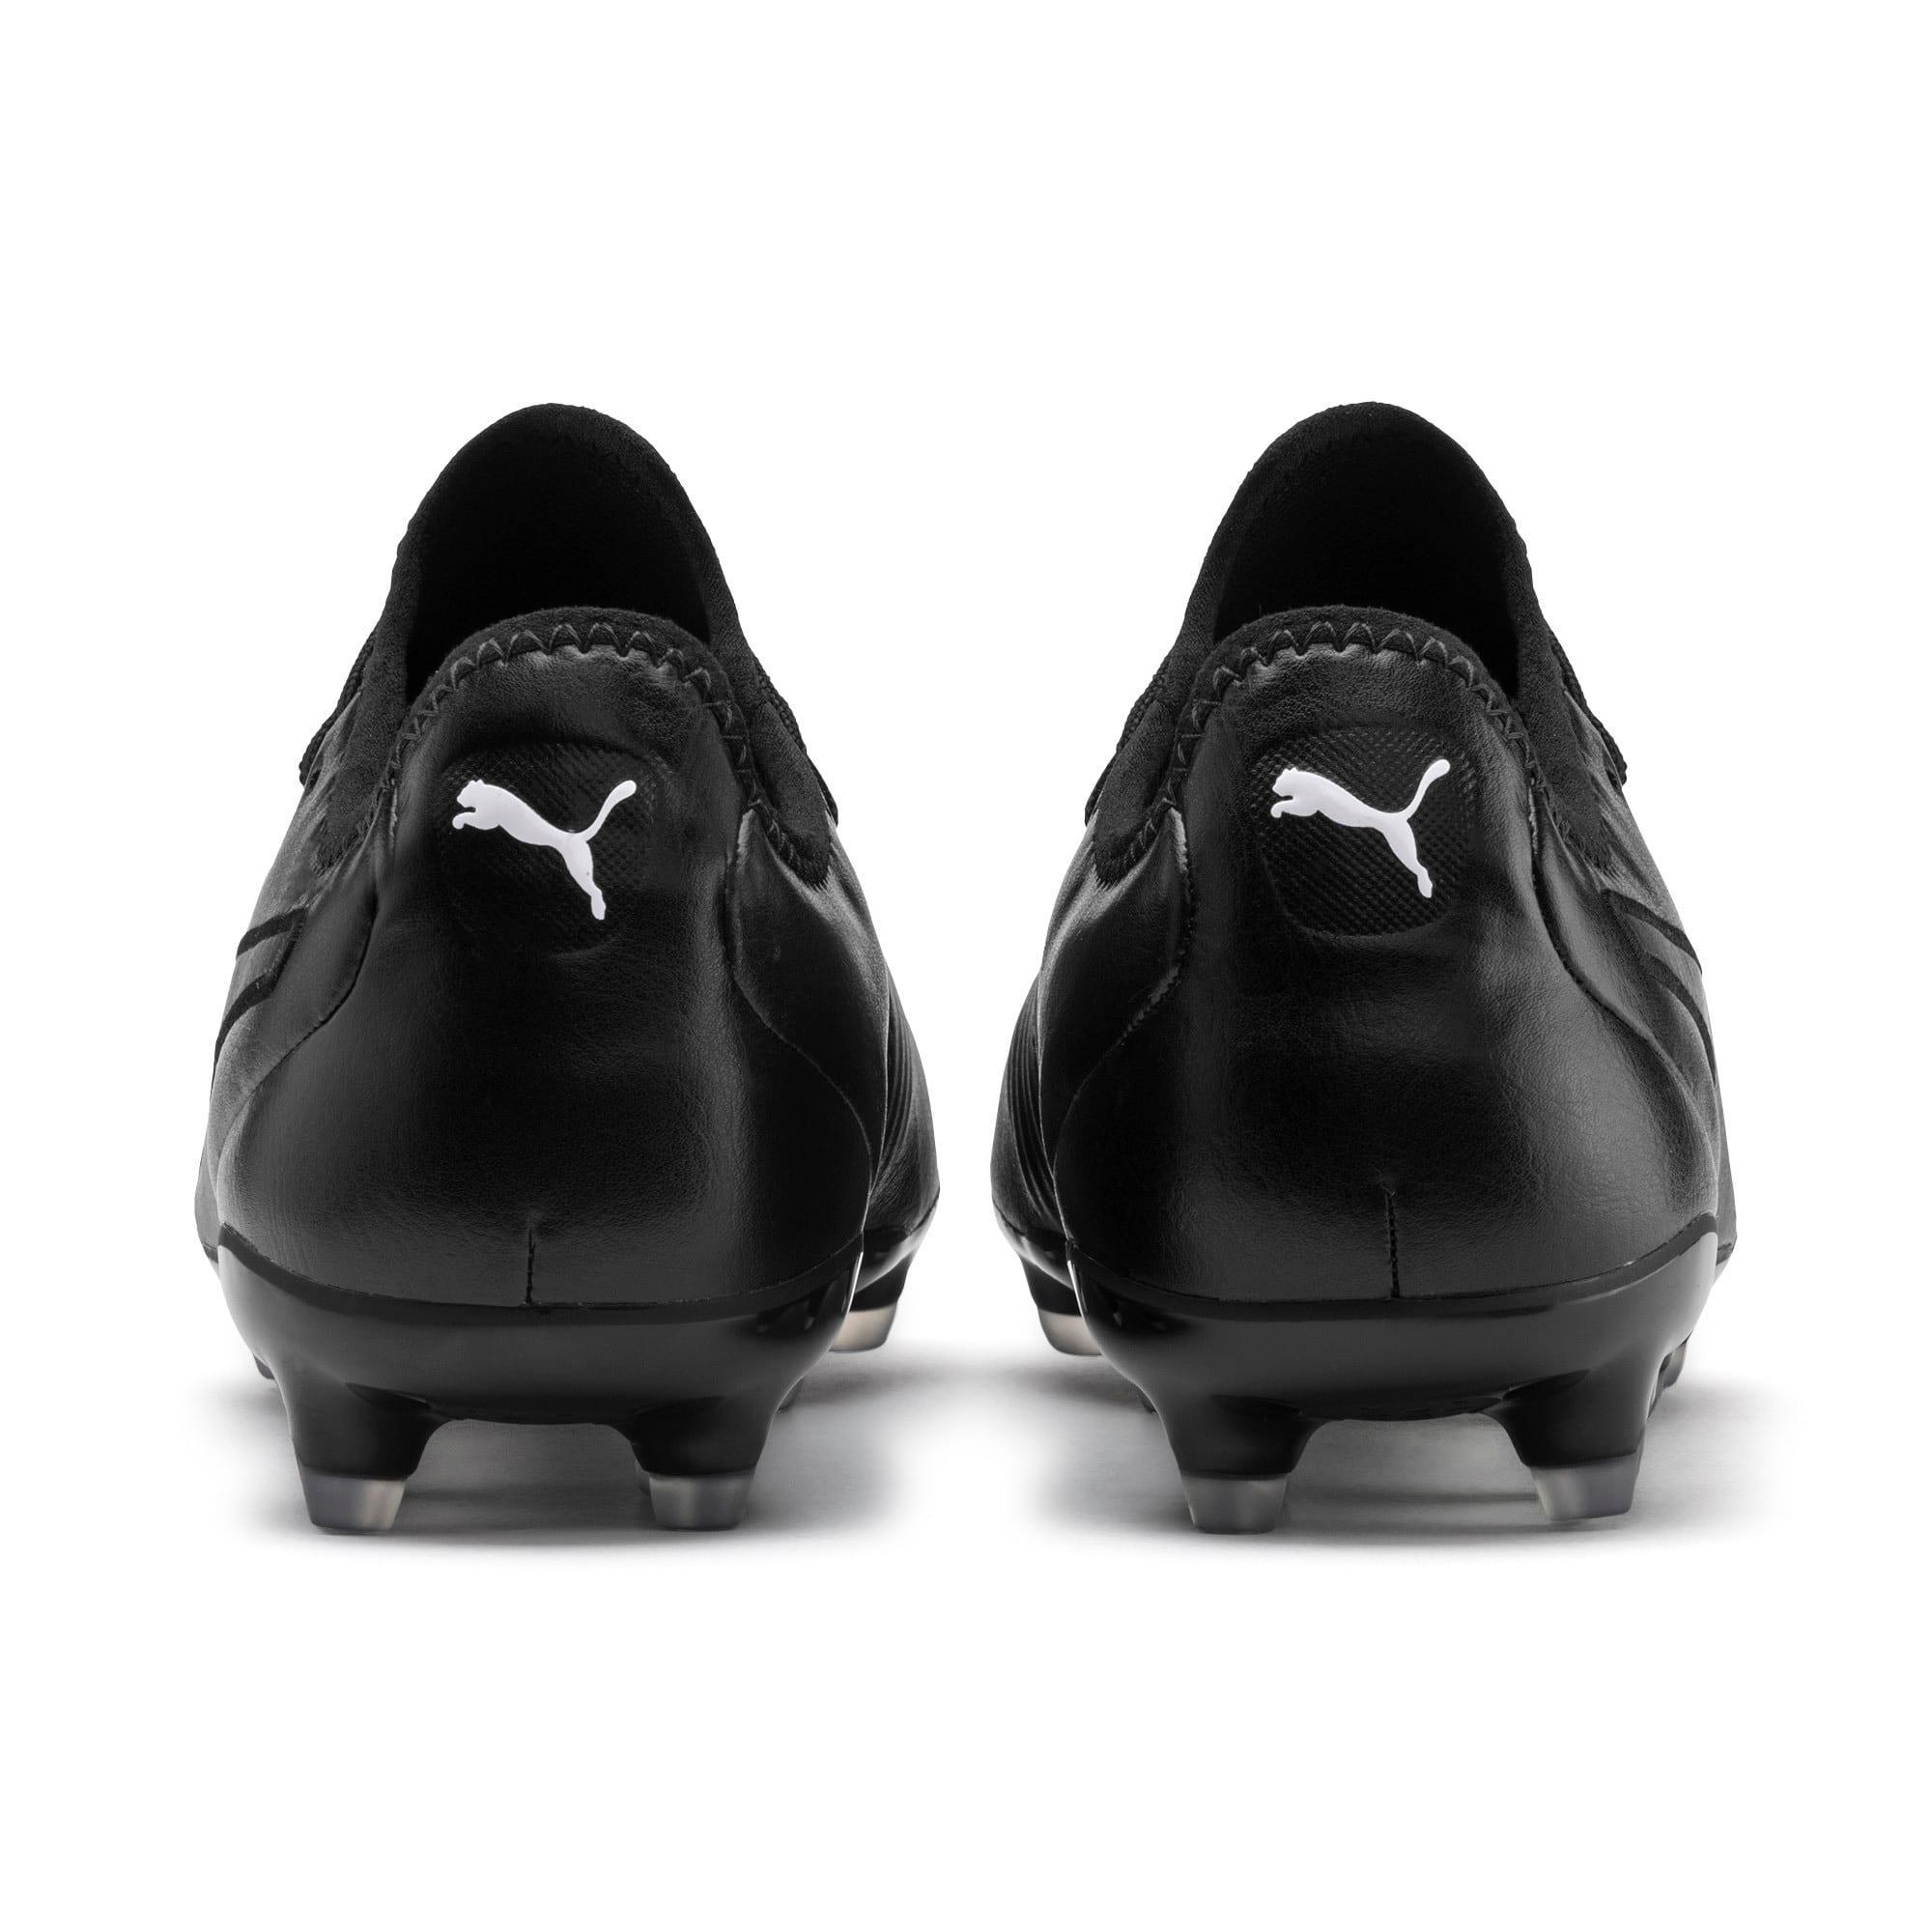 Thumbnail 4 of KING Pro FG Football Boots, Puma Black-Puma White, medium